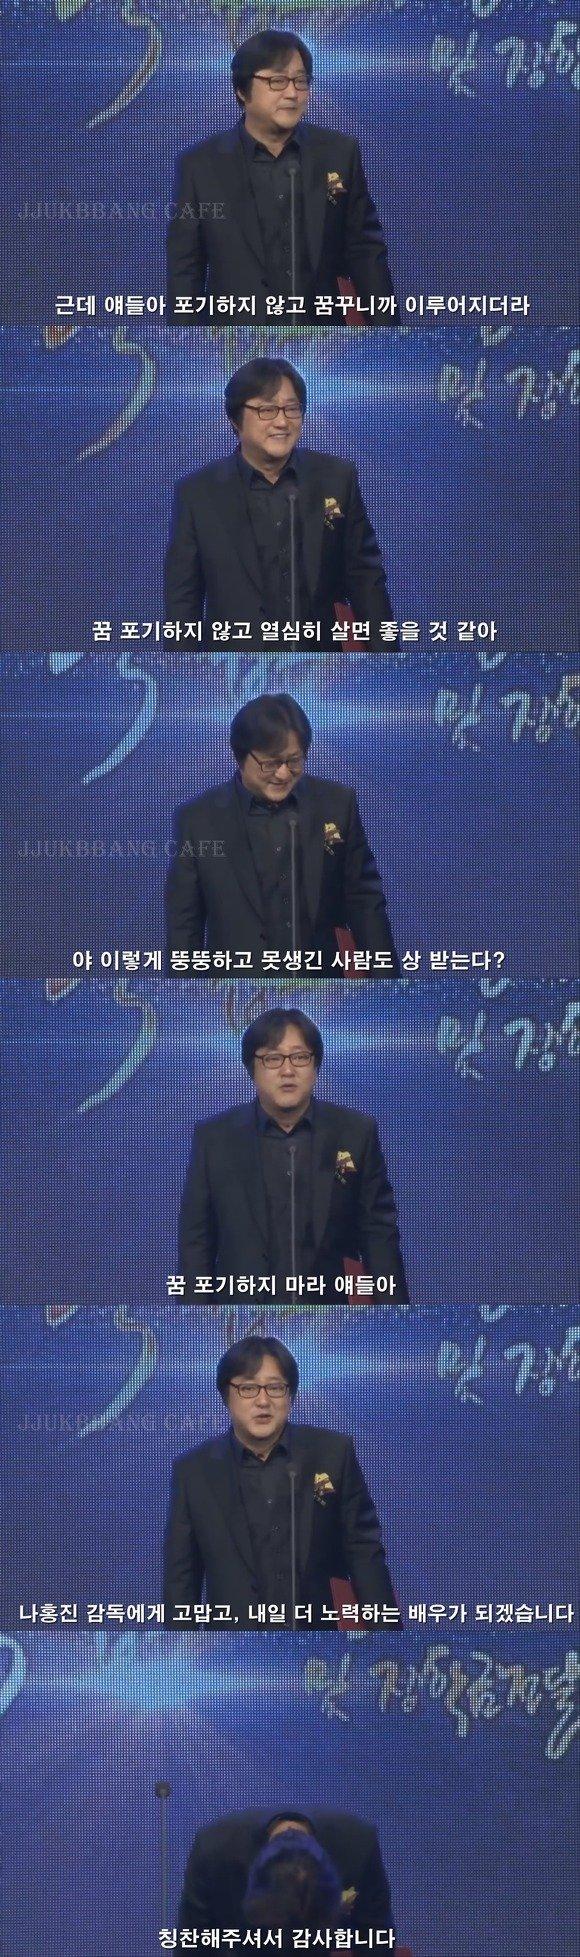 3.jpg 청각장애 고백한 곽도원 수상소감.JPGIF